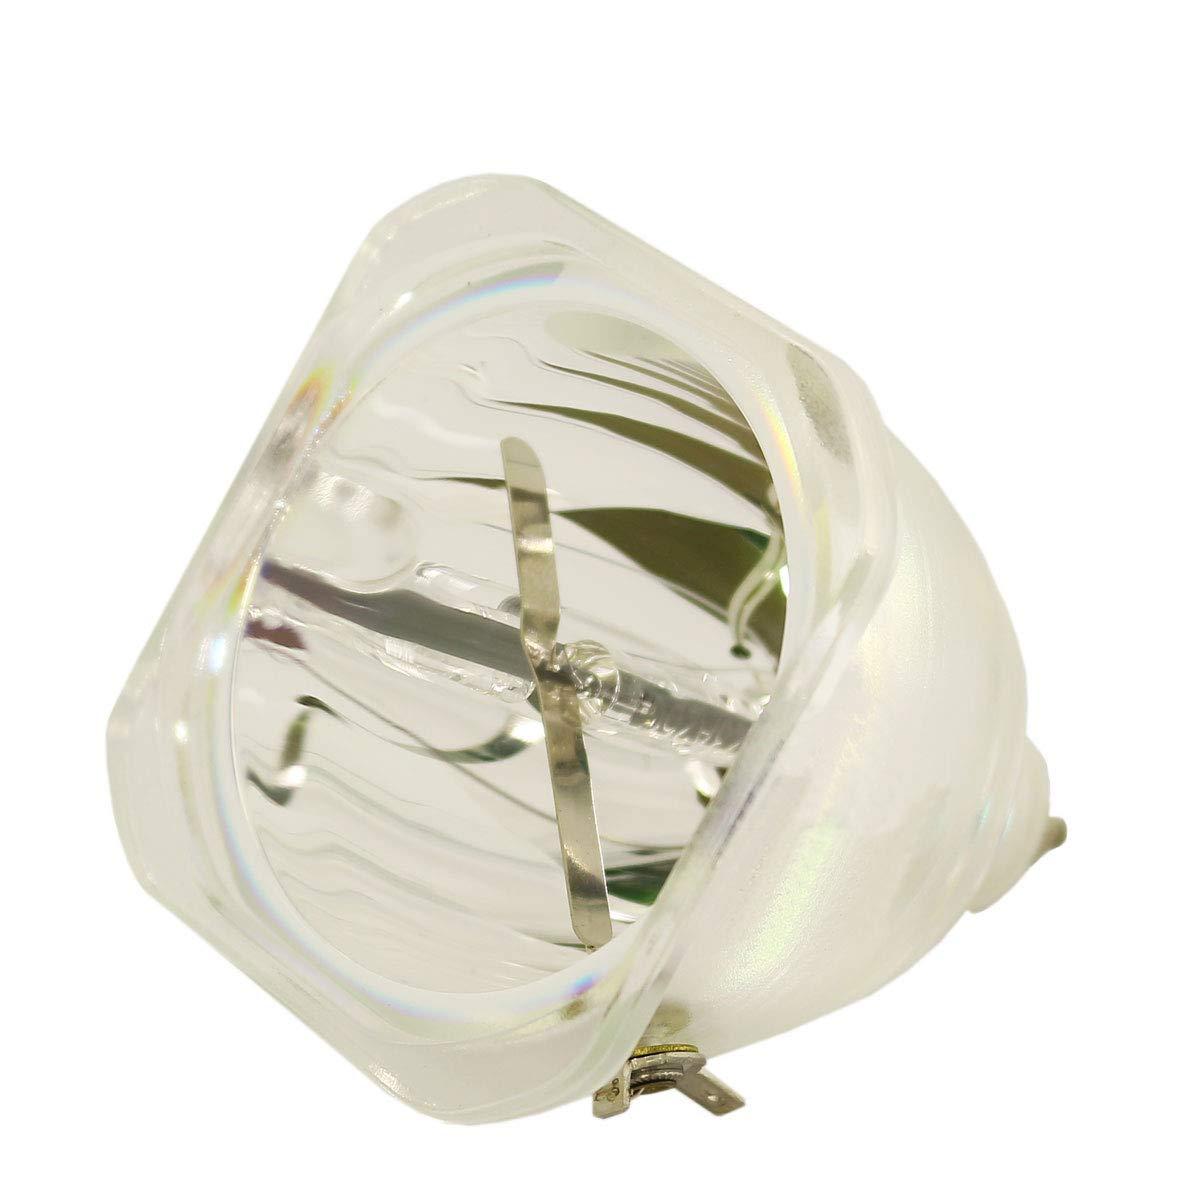 LYTIO エコノミー Dell 310-3836プロジェクターランプ(電球のみ) 310 3836   B07JJ37Y7J